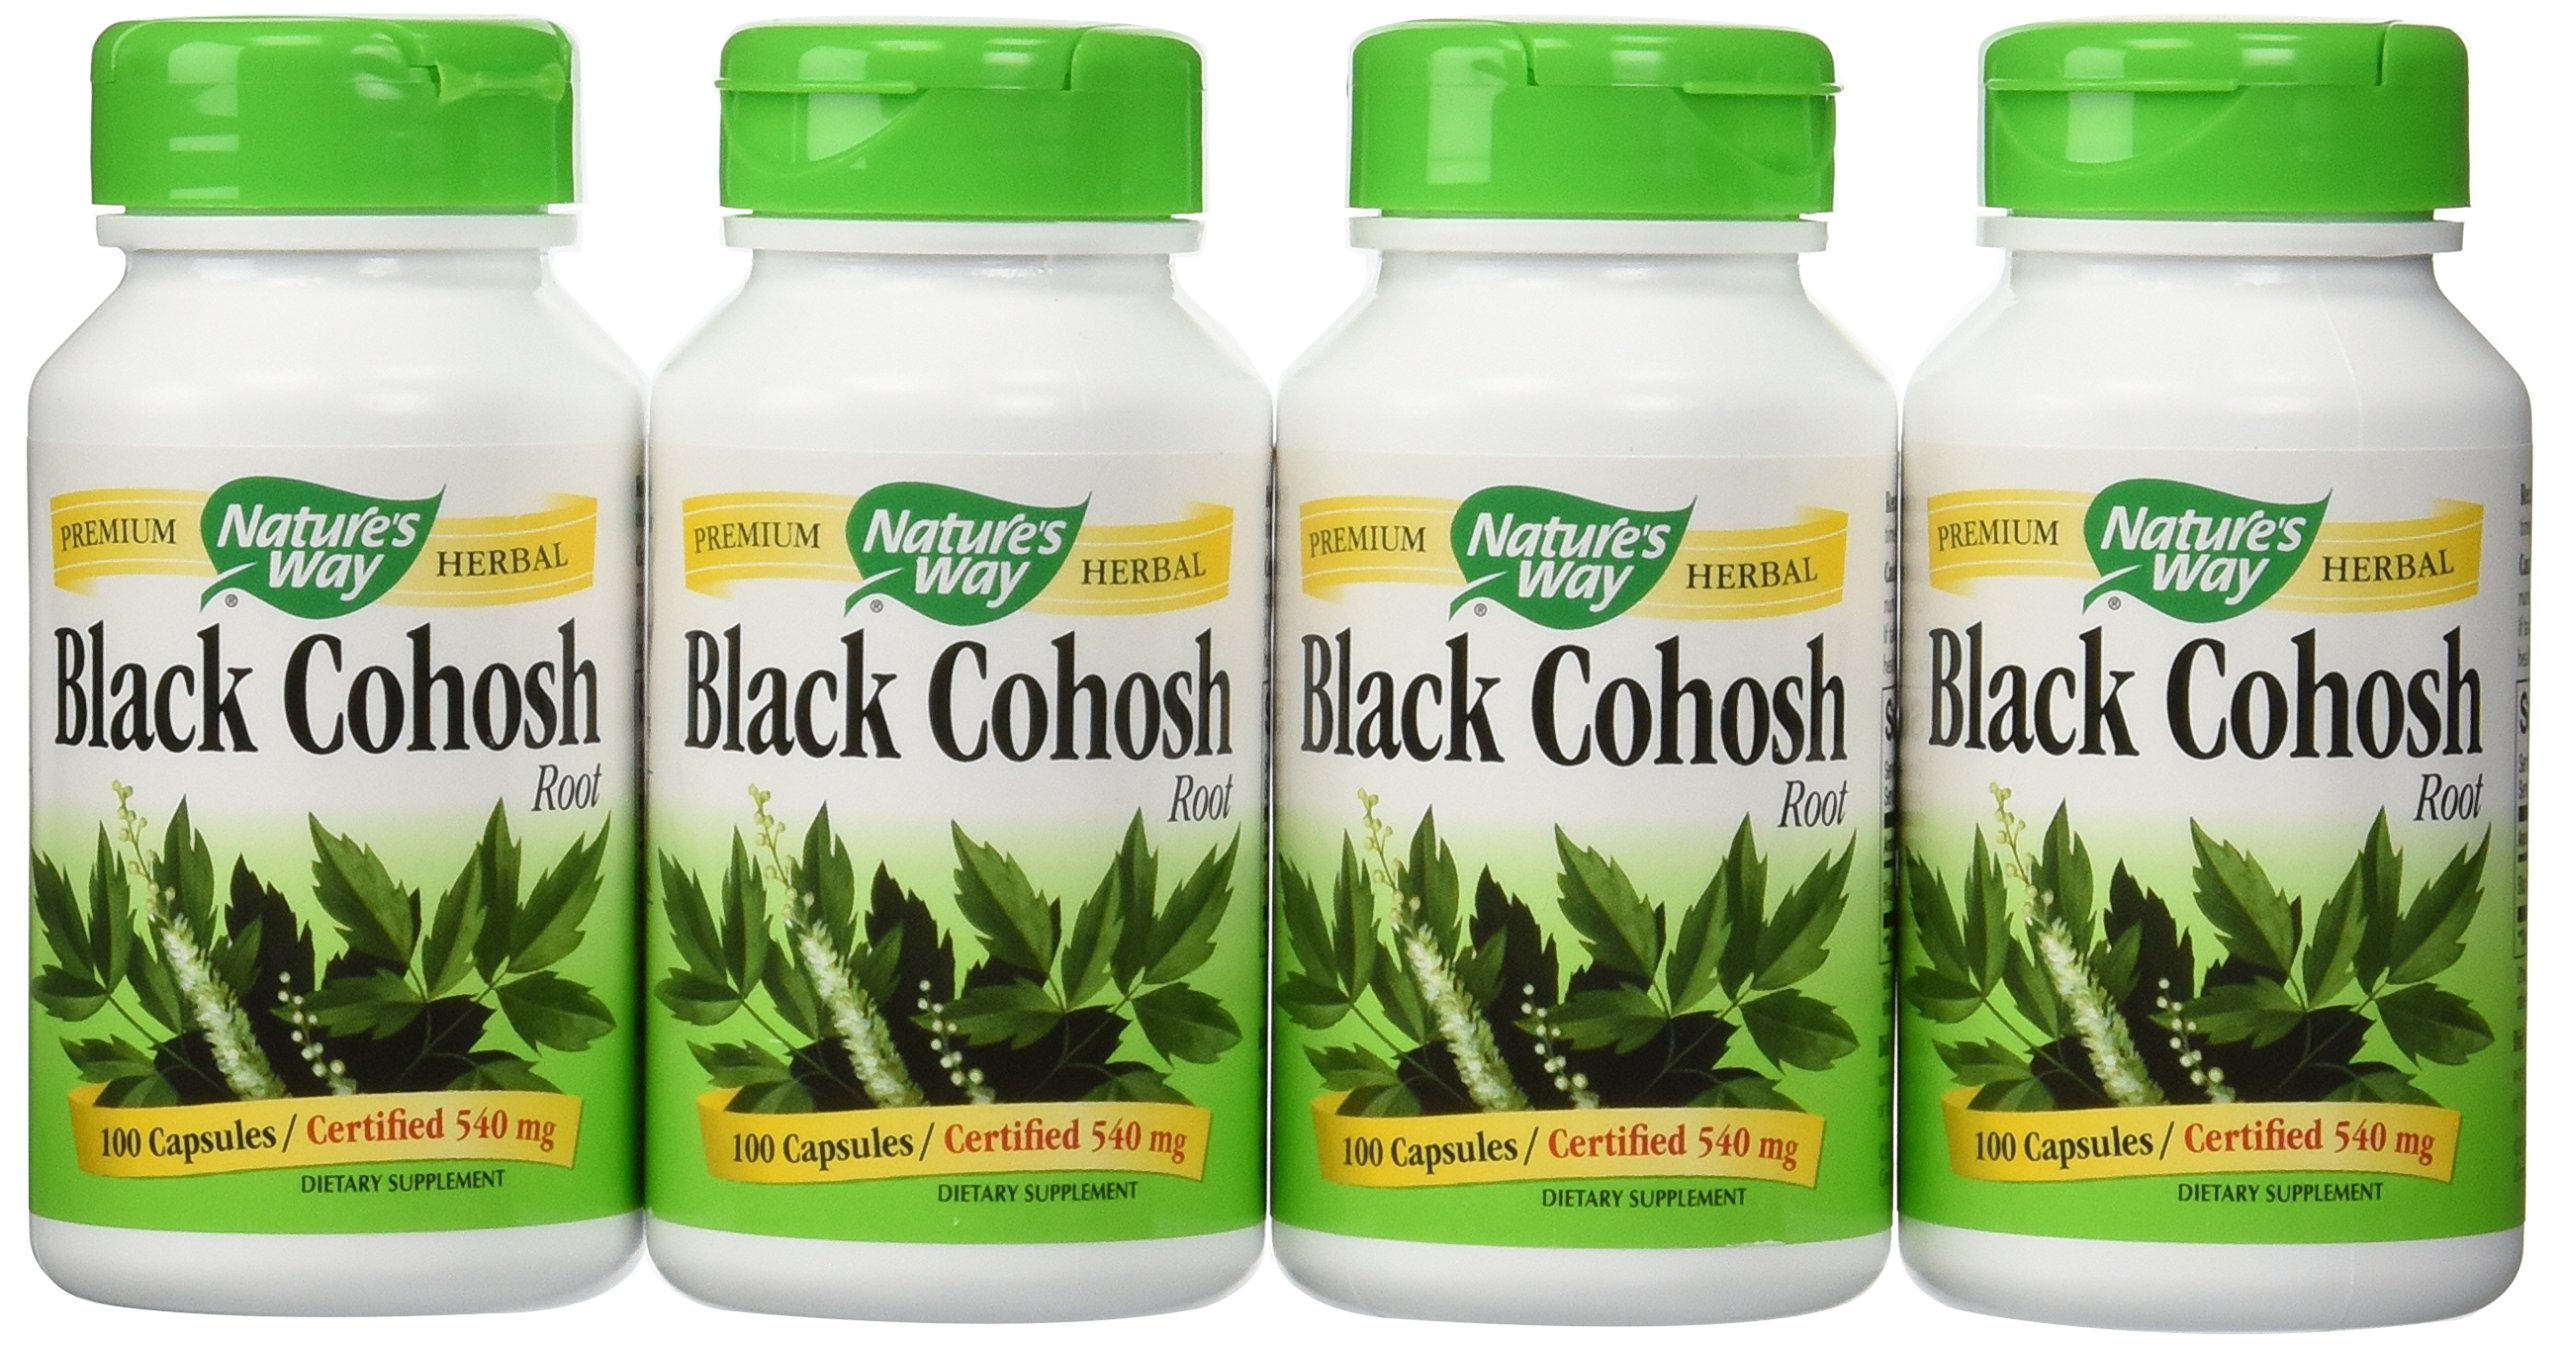 Nature's Way Black Cohosh Root, 100 Capsules (Pack of 4)